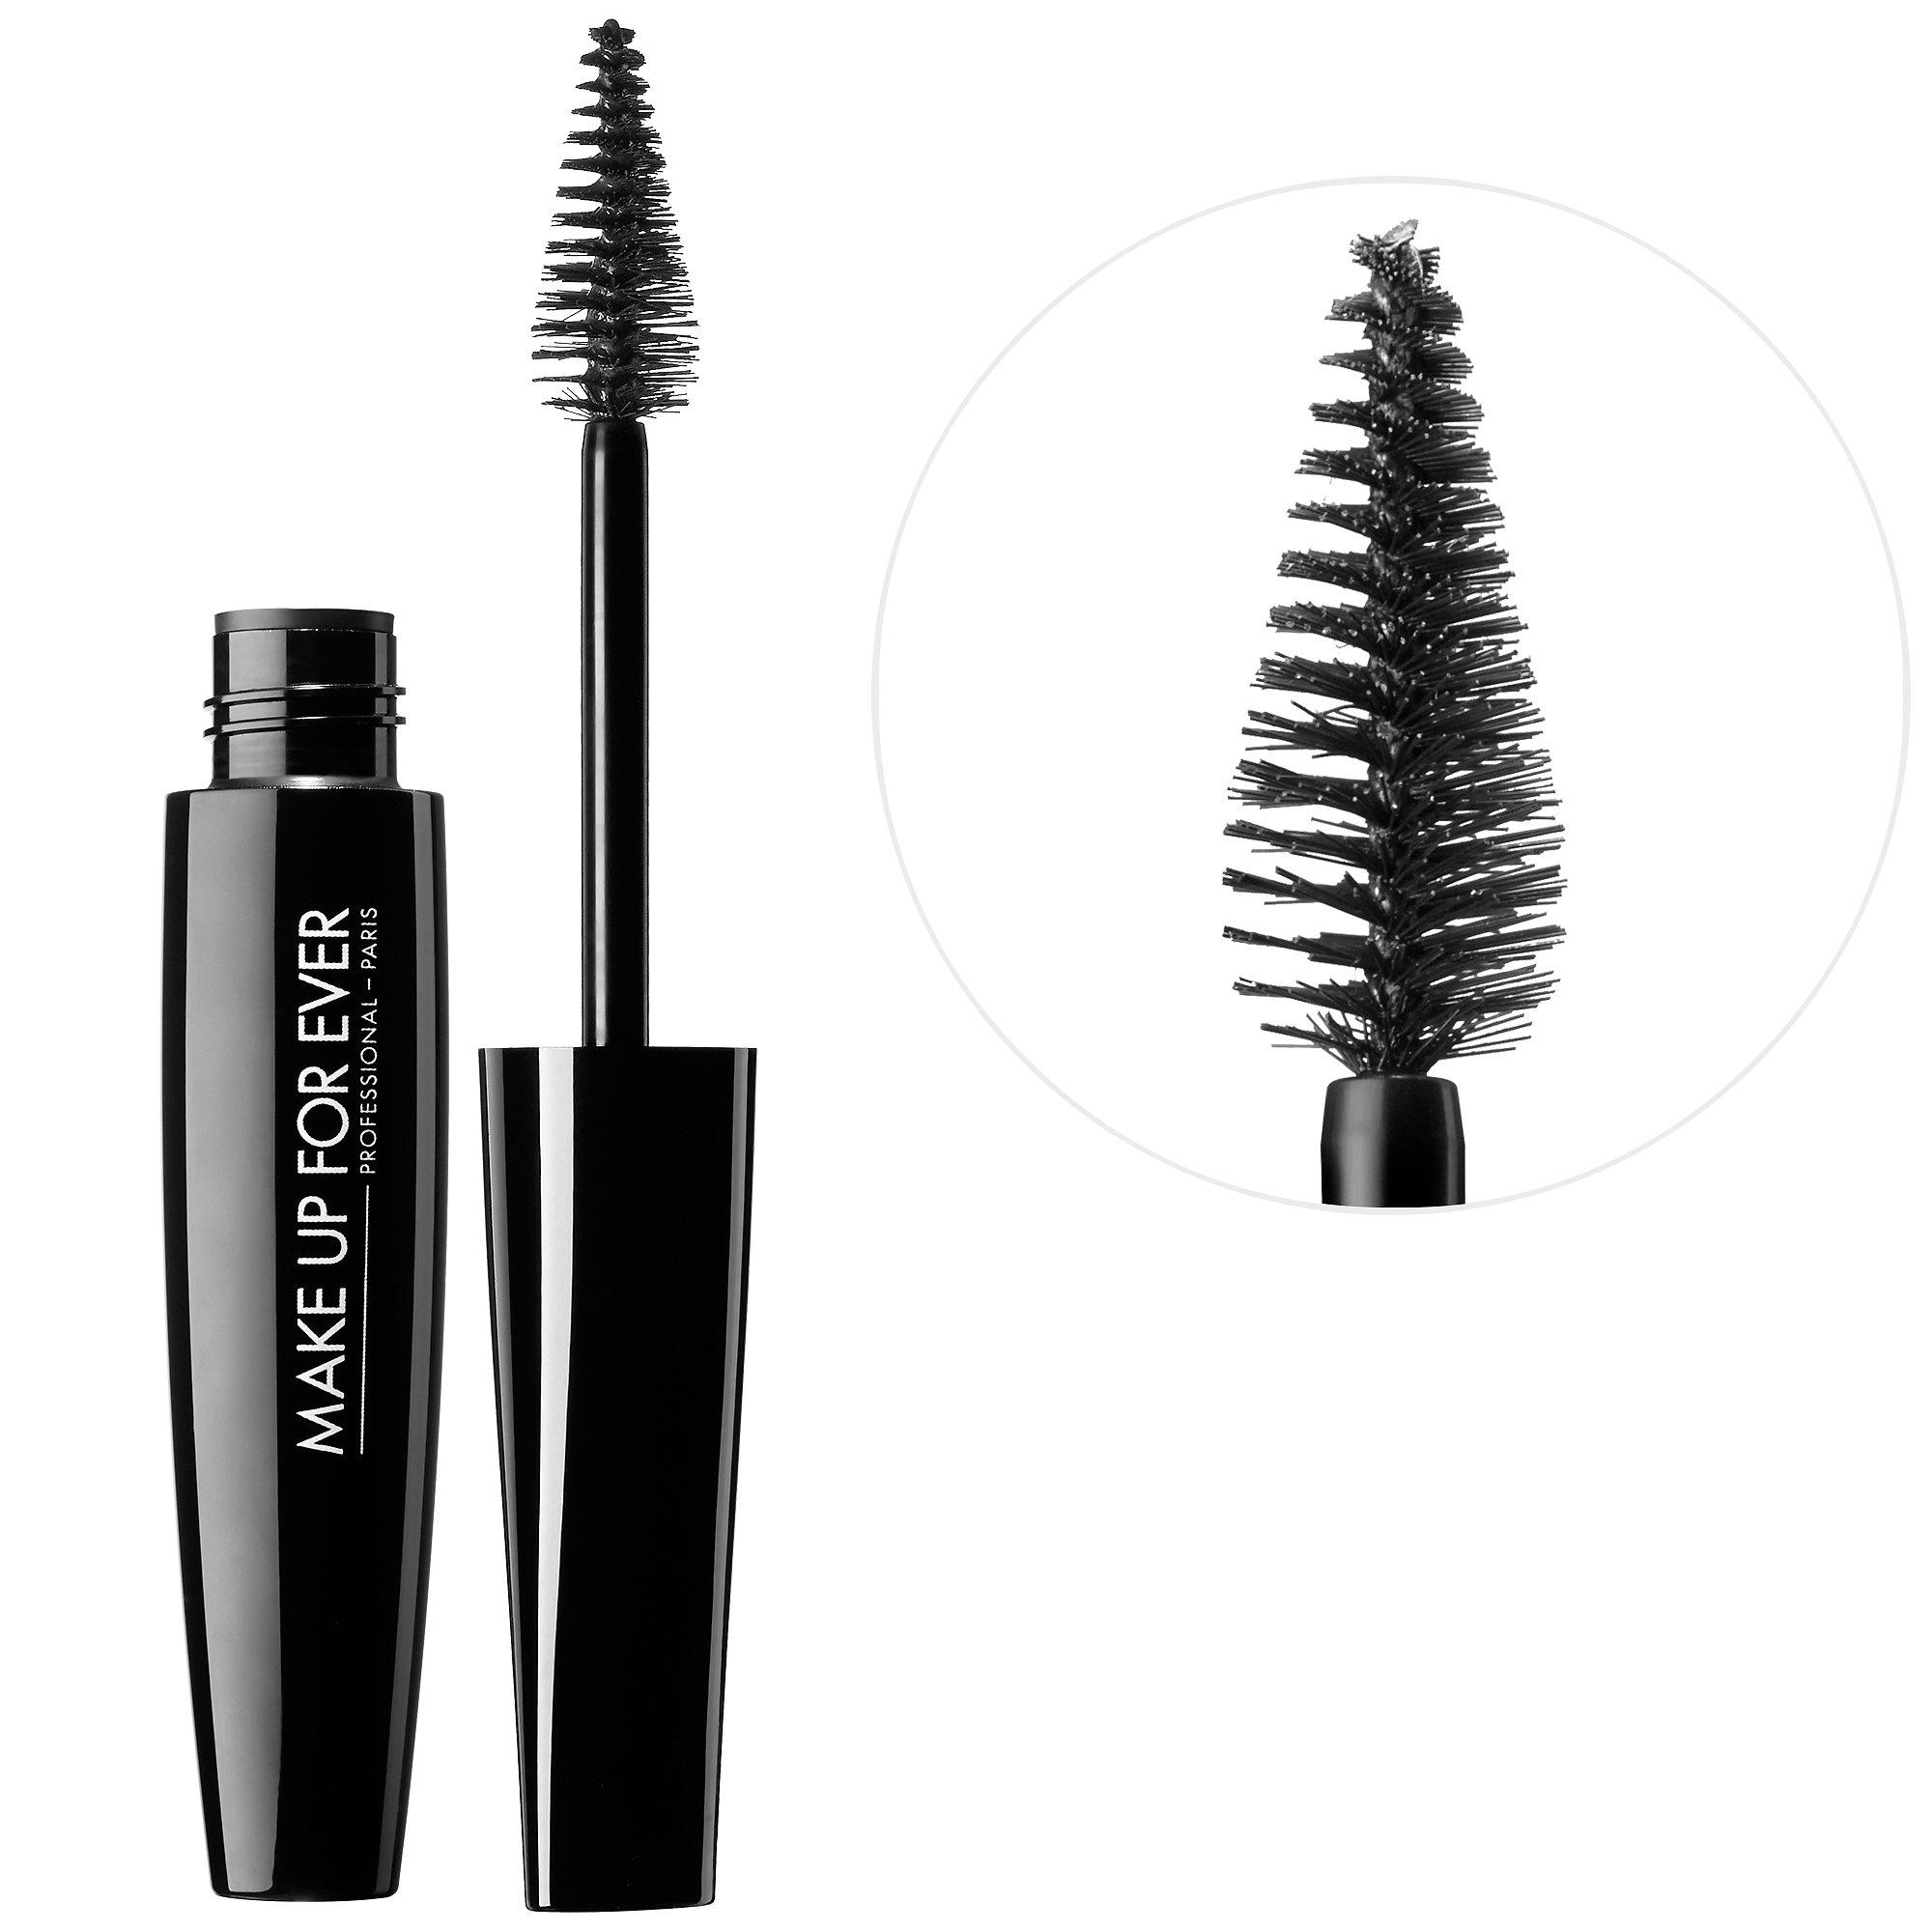 Makeup forever smoky extravagant mascara